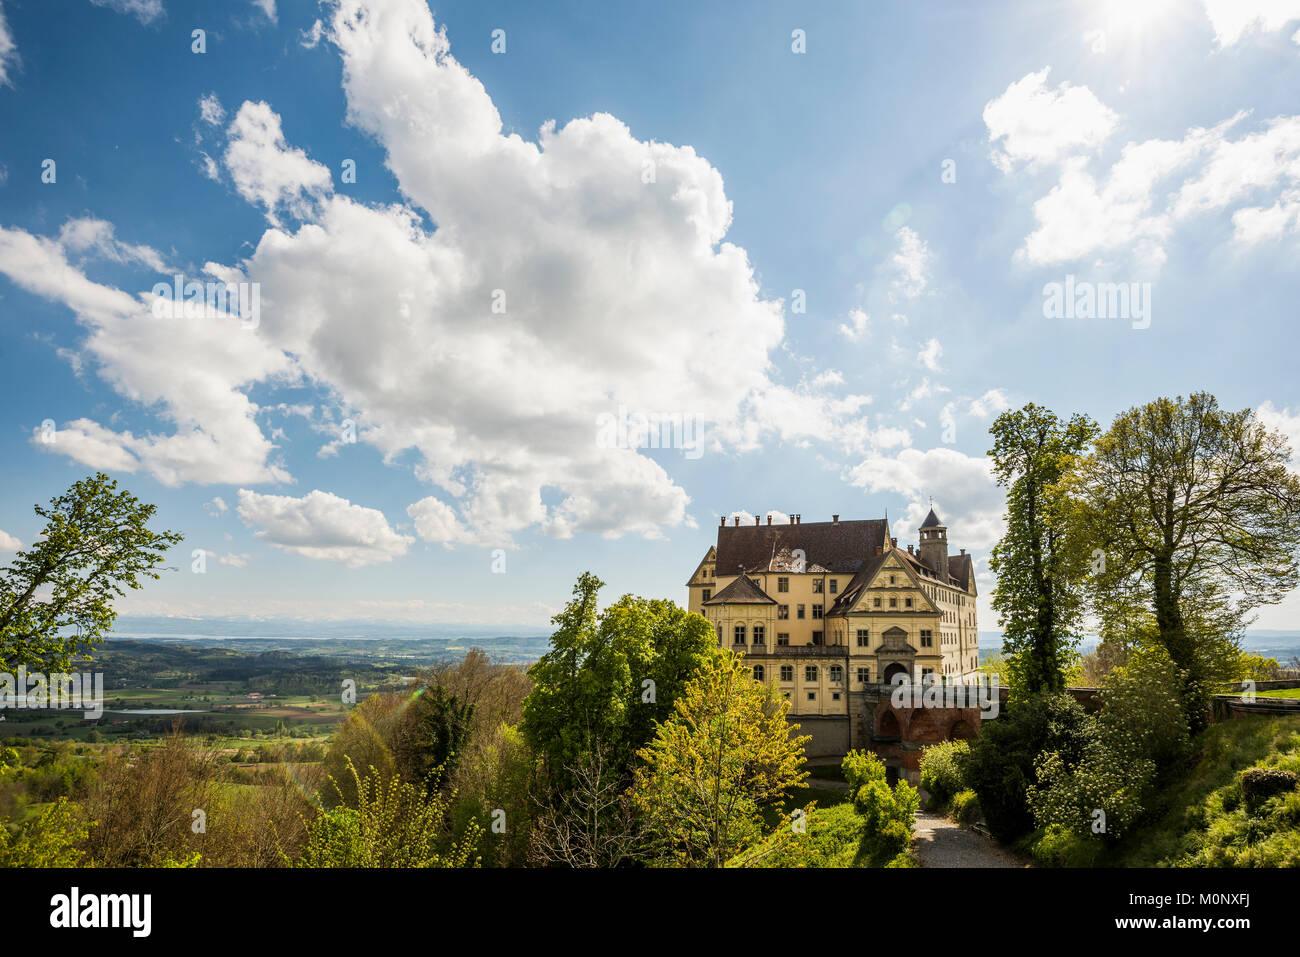 Heiligenberg Castle,Renaissance castle,Heiligenberg,Lake Constance District,Linzgau,Lake Constance,Baden-Württemberg - Stock Image